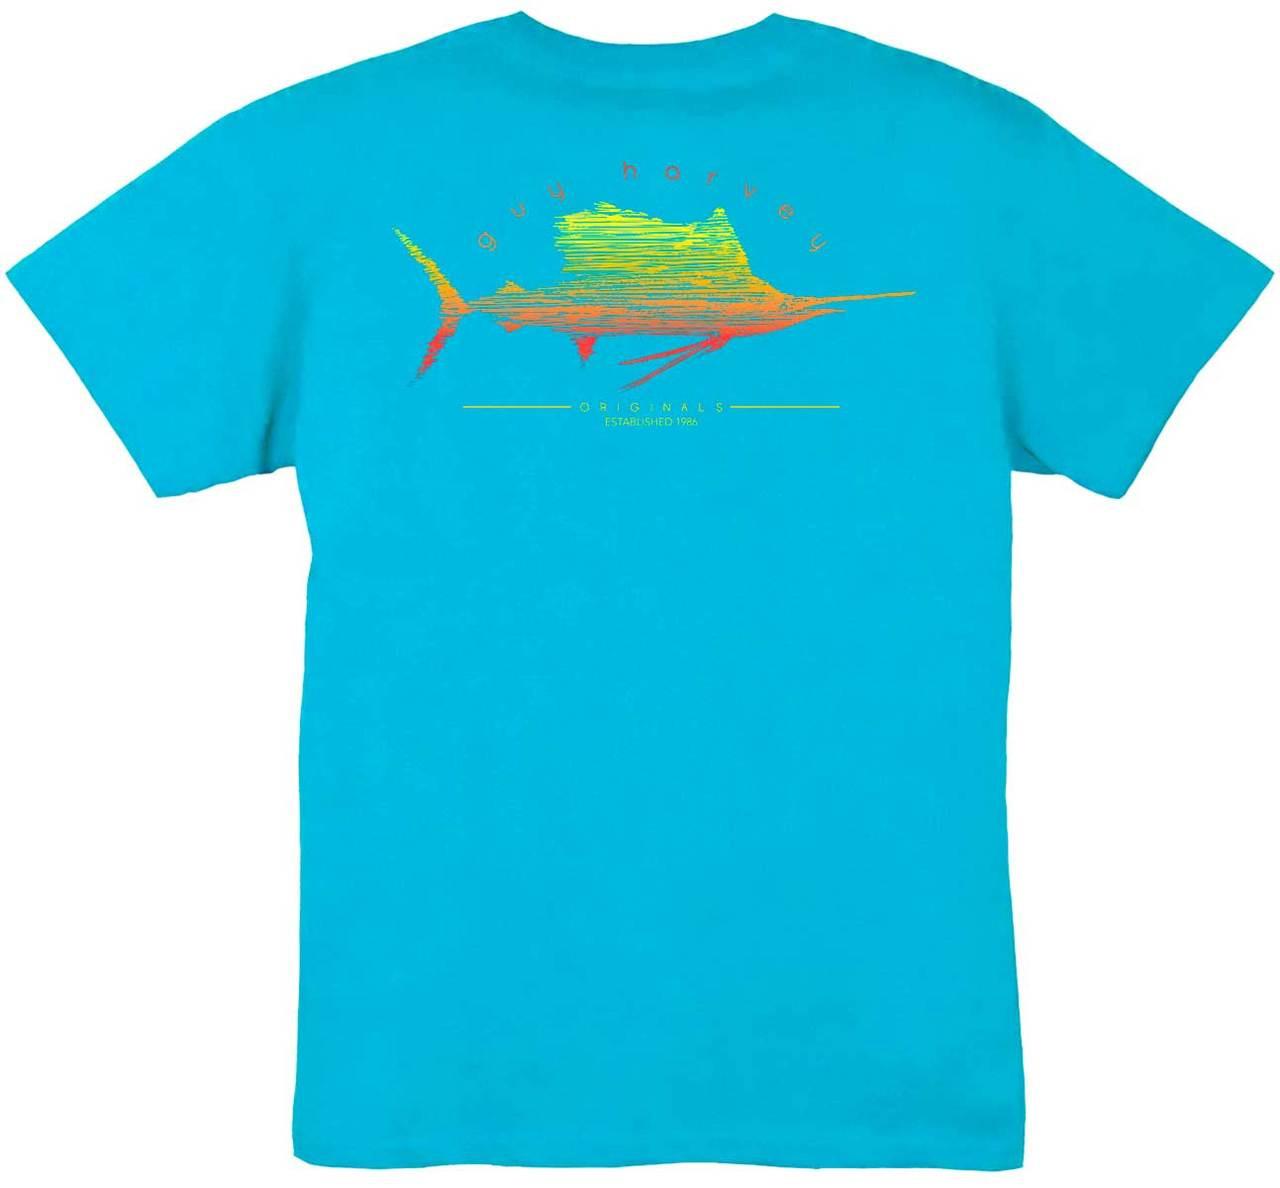 fac5b2de Guy Harvey Sailfish Scribble Boys Tee in Reef Blue. $15.00. Image 1. See 1  more picture